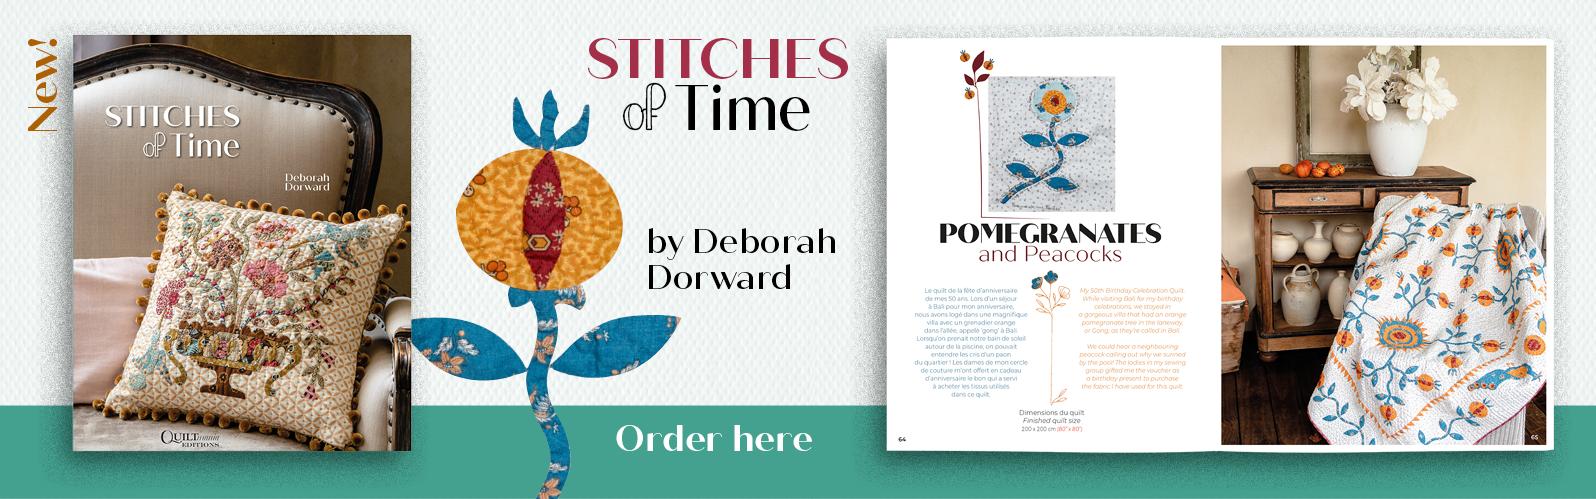 Banner Stitches of Time - Deborah Dorward